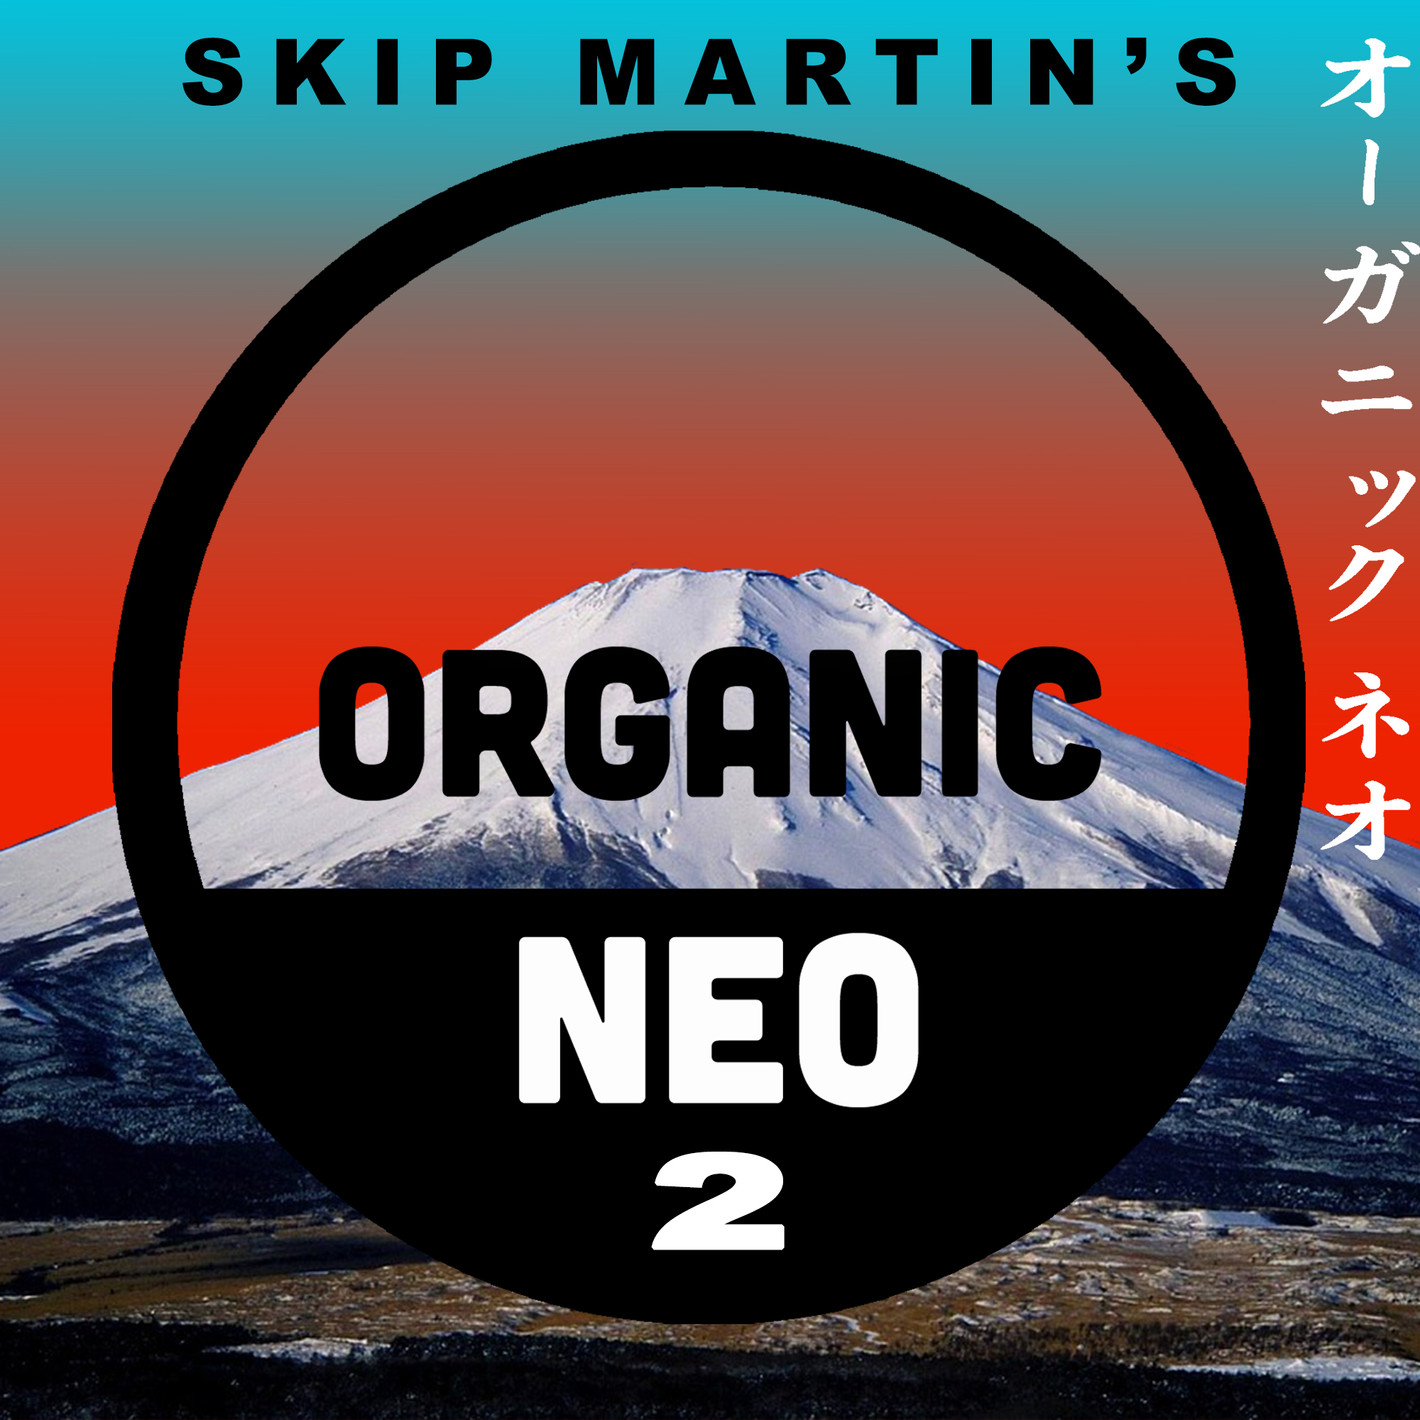 ORGANIC NEO 2 COVER